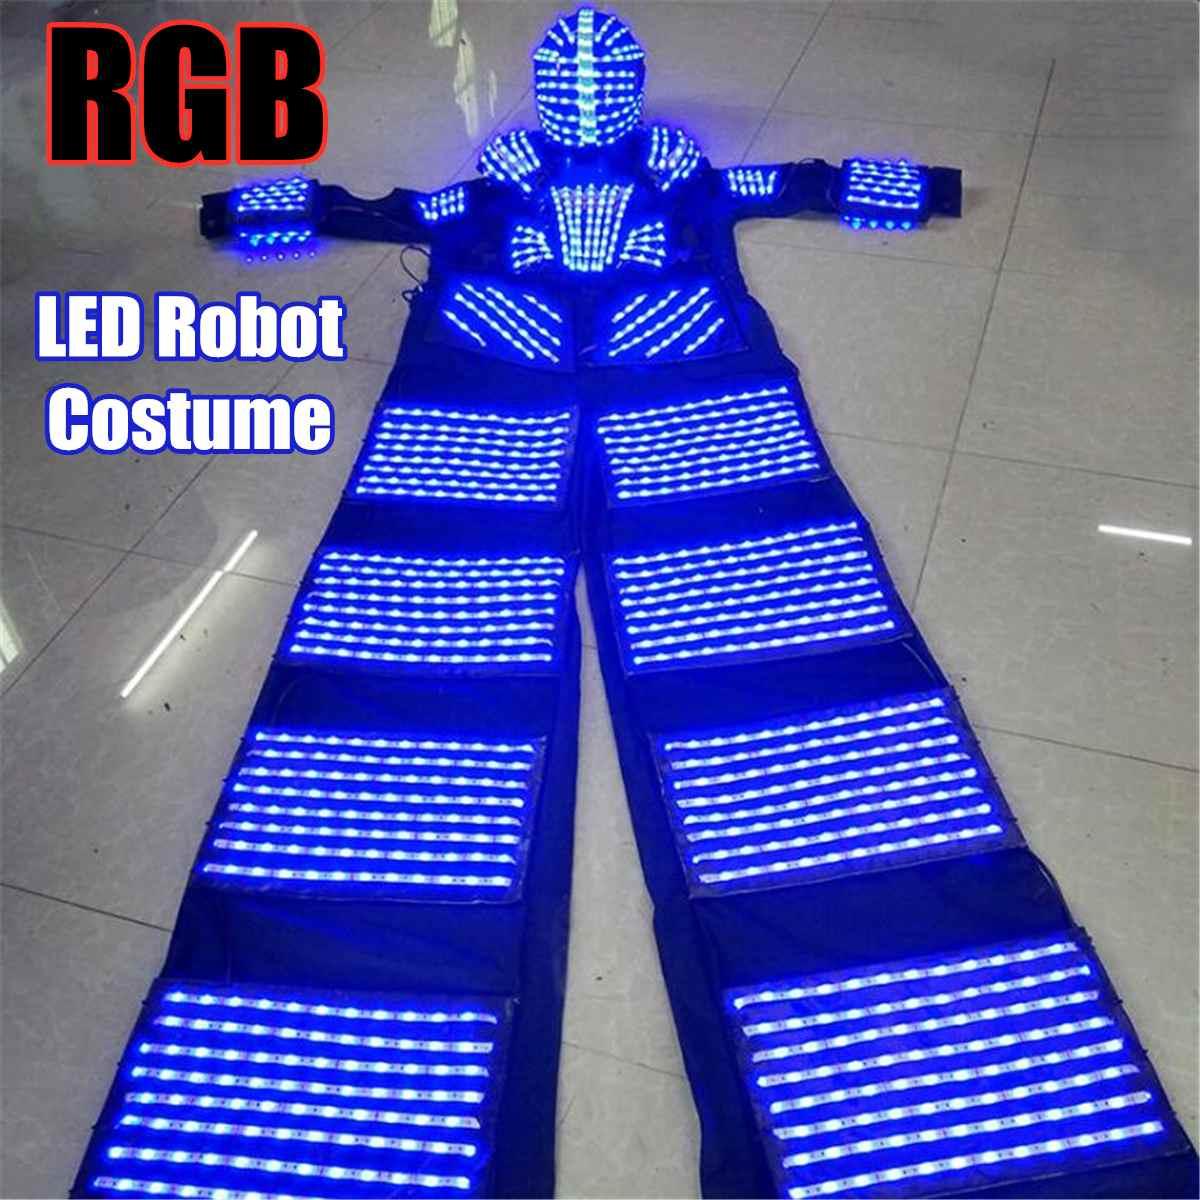 Stilts Walker LED Light LED Dancer~ Costume 2.5m LED Robot Suit For Party Performance Electronic Music Festival~DJ Show